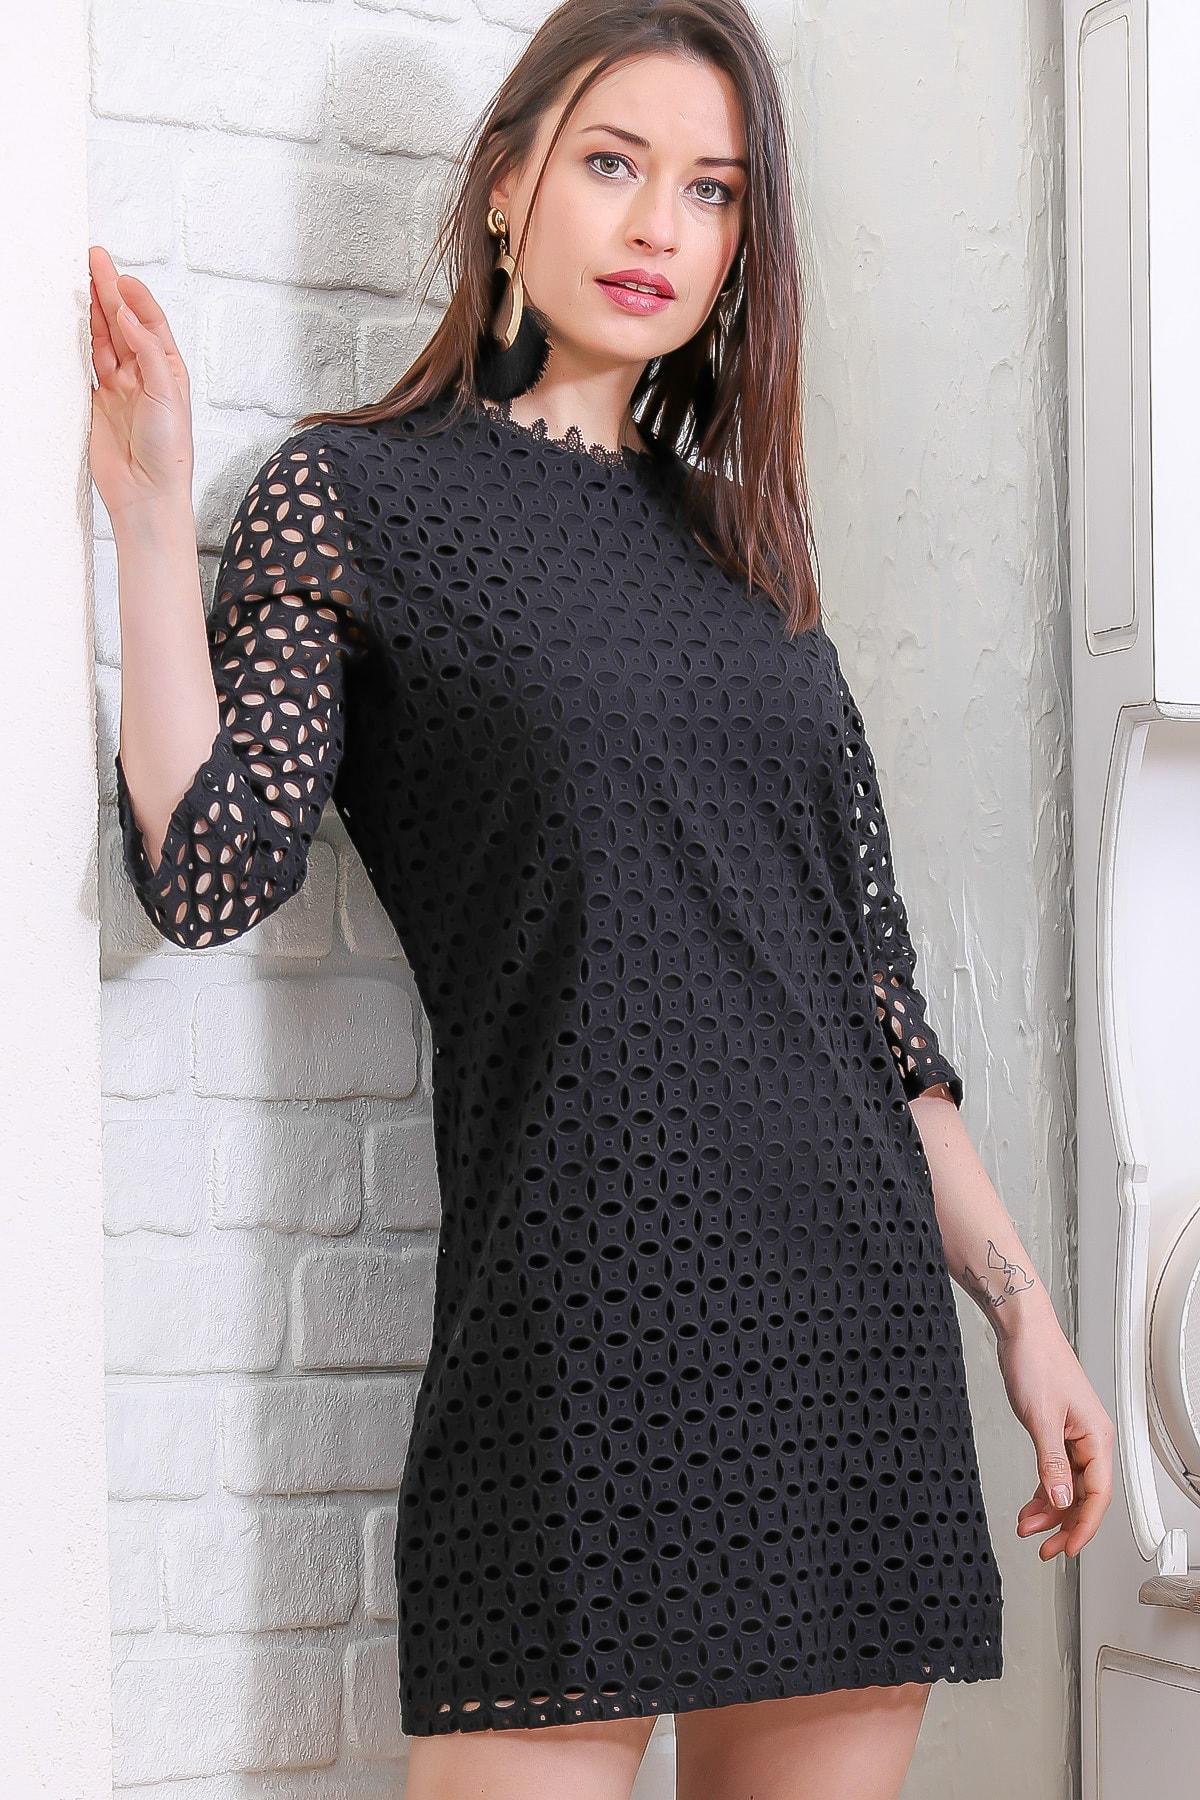 Chiccy Kadın Siyah Retro Delik İşi Nakış Detaylı Astarlı Elbise M10160000EL96972